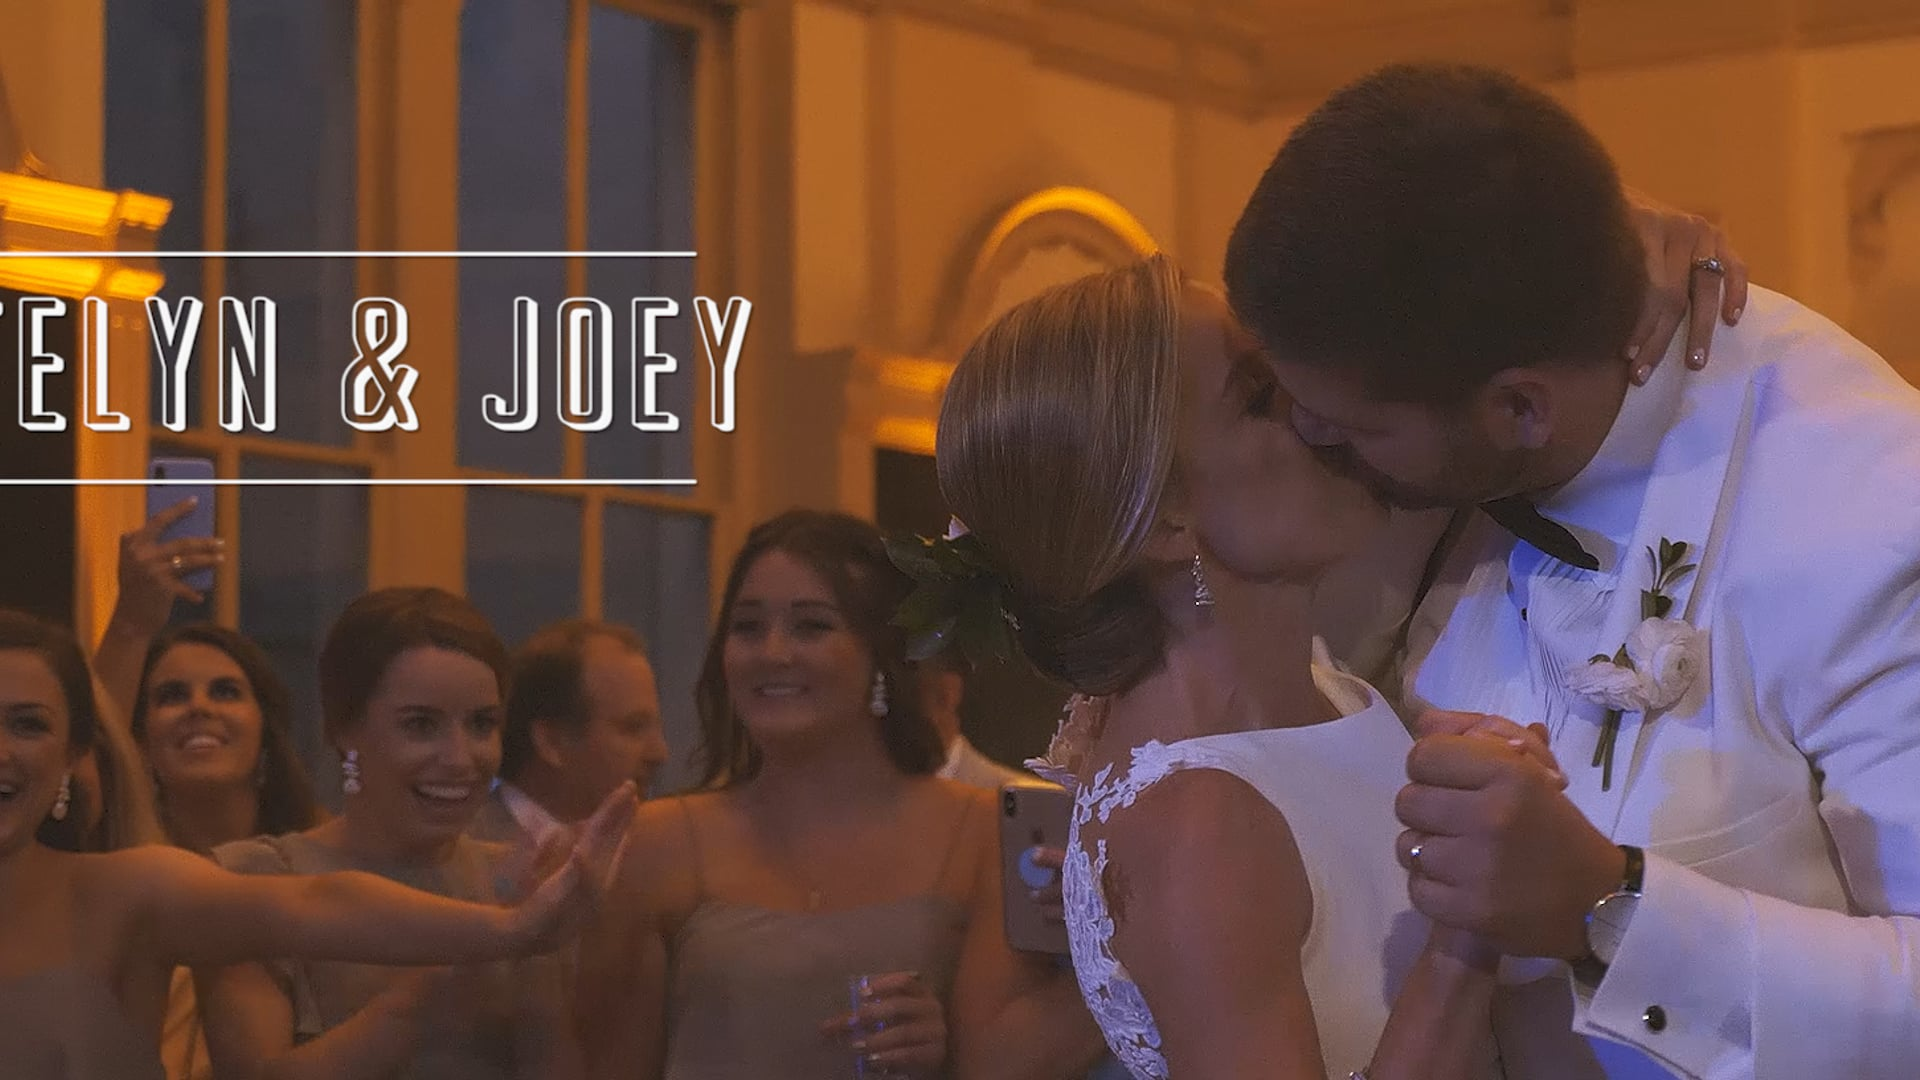 Katelyn & Joey / Great Letters between the Bride & Groom / New Orleans Board of Trade